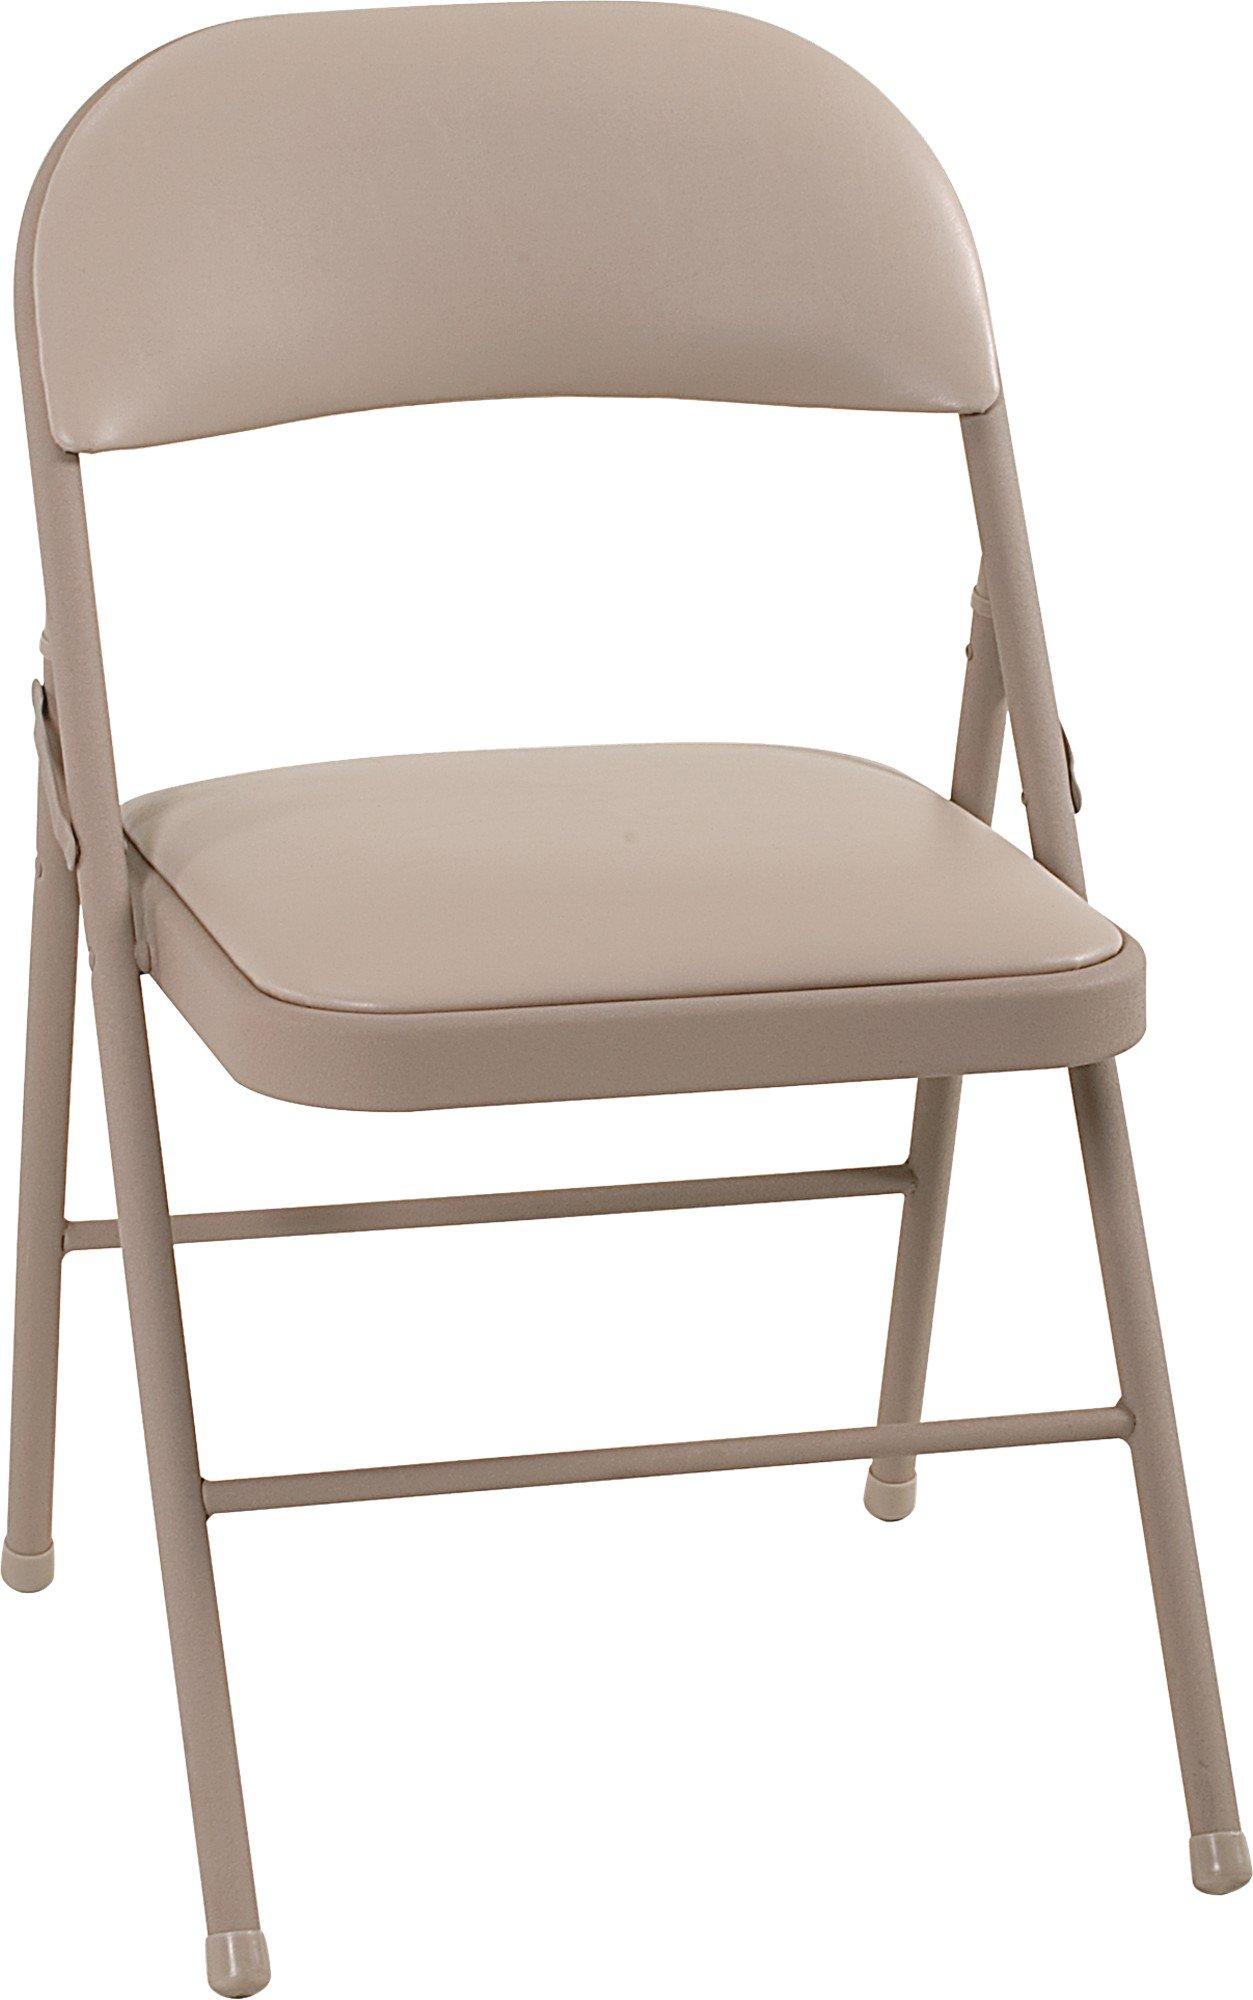 Cosco Vinyl Folding Chair Antique Linen (4-pack) by Cosco